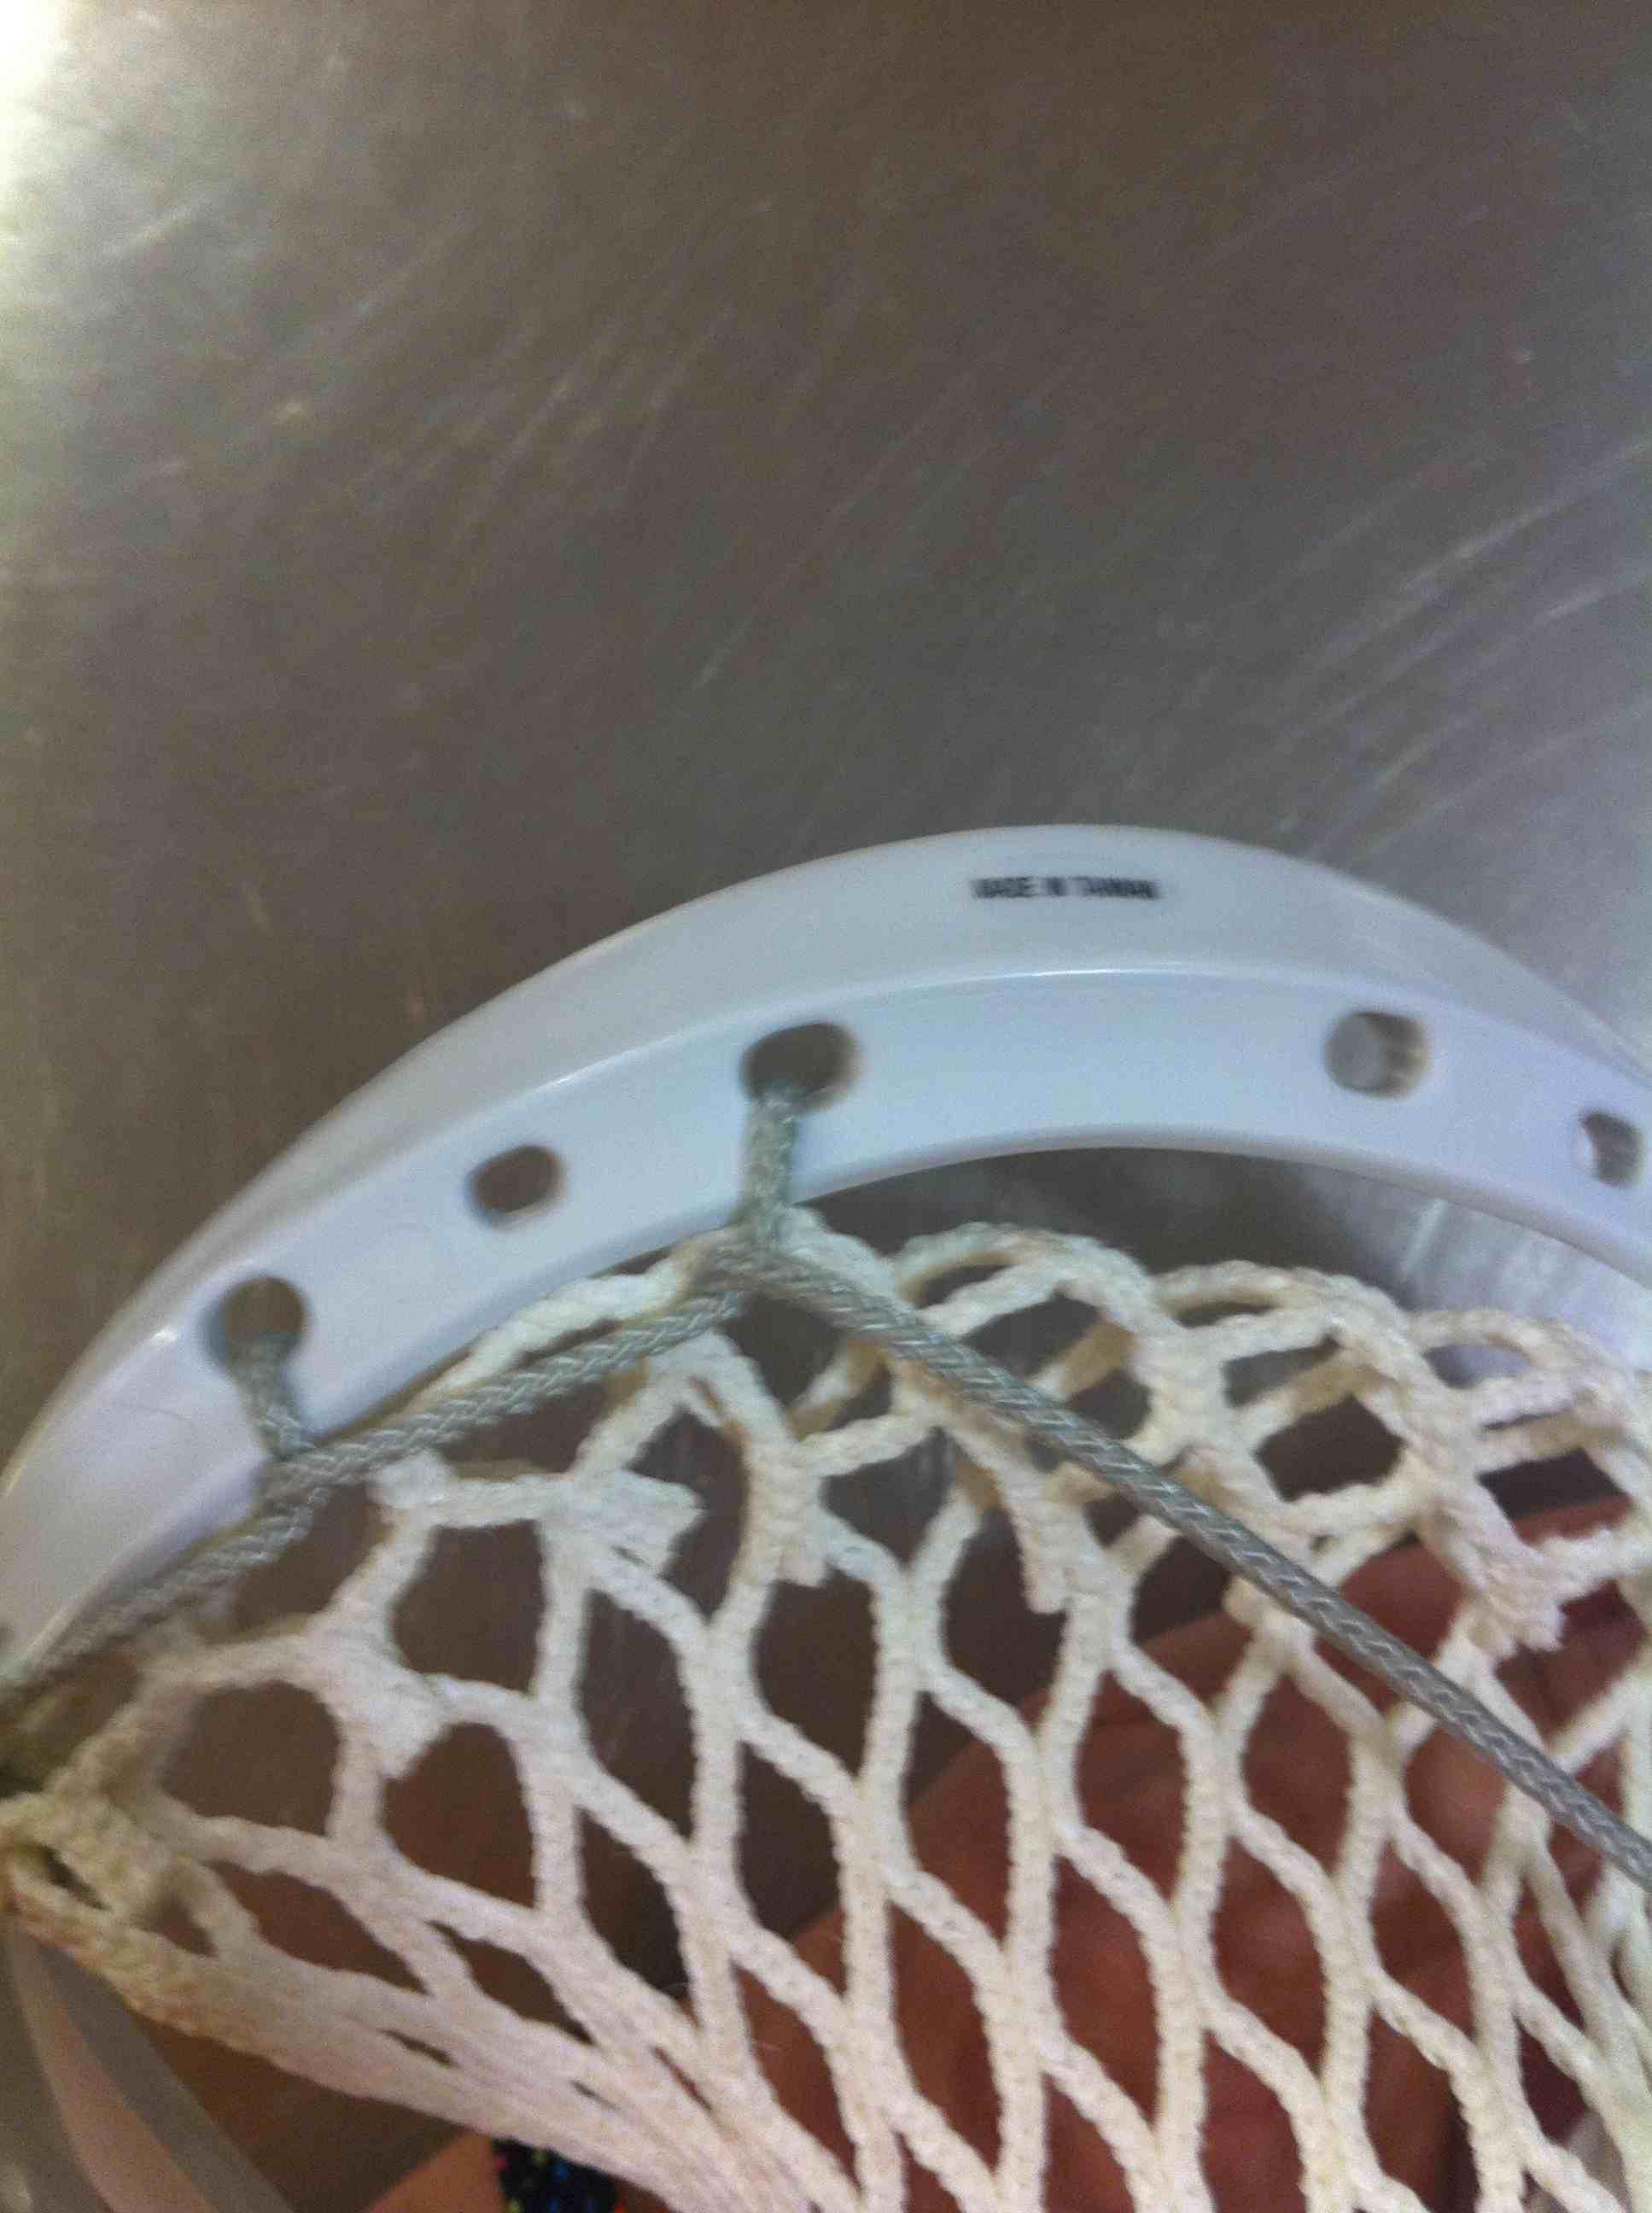 Stringing Supplies lacrosse lax